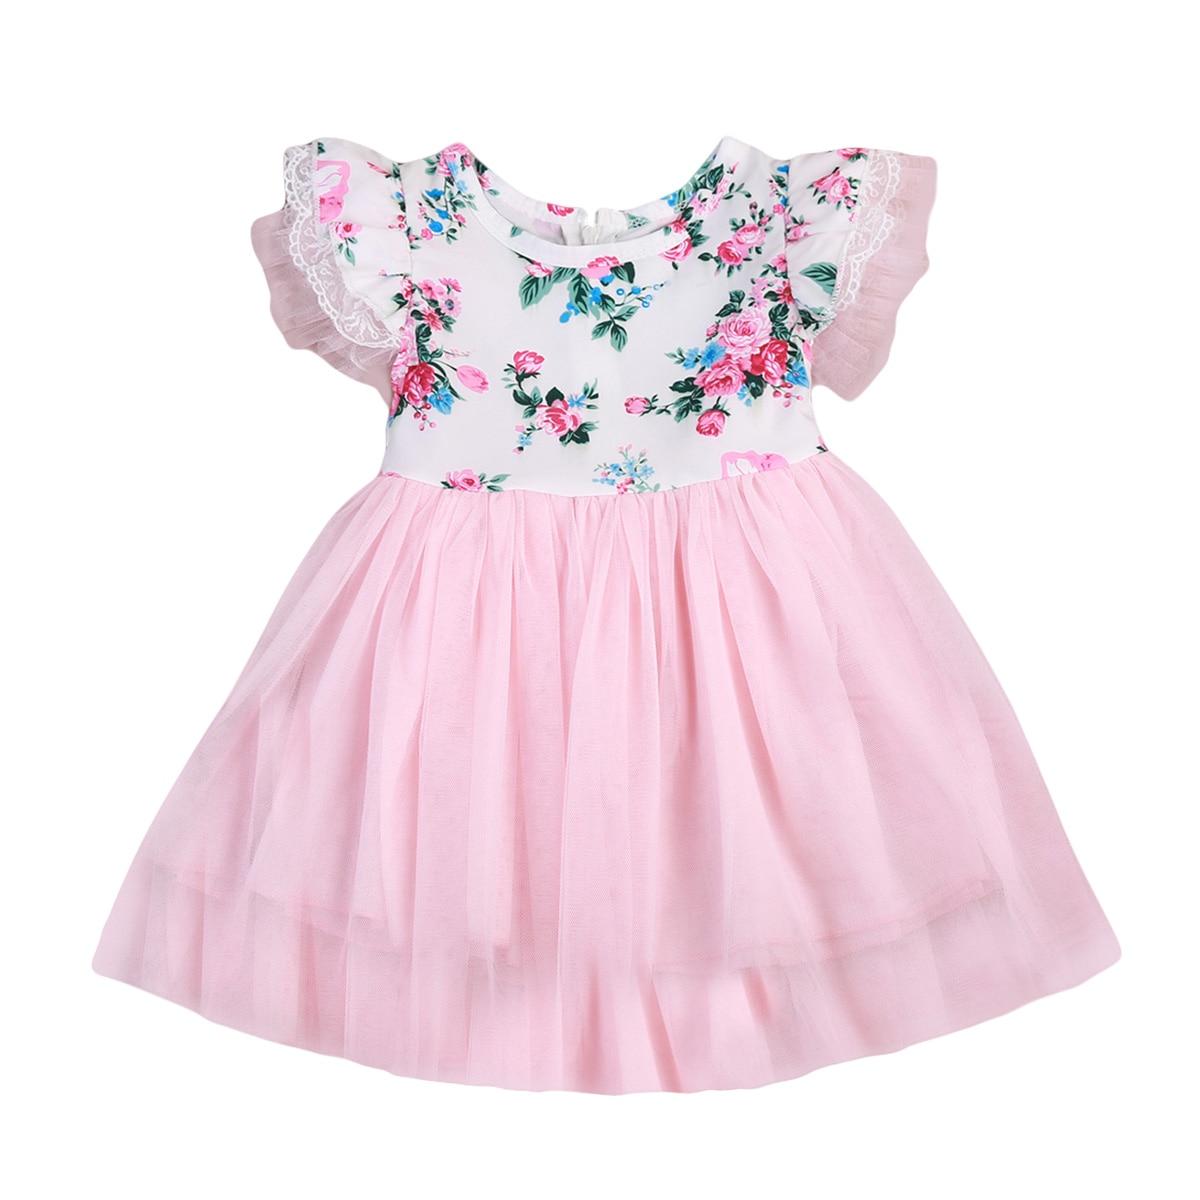 Newborn Baby Girls 1T-6T Kids Toddler Princess Dress Pageant Wedding Tulle Tutu Dress